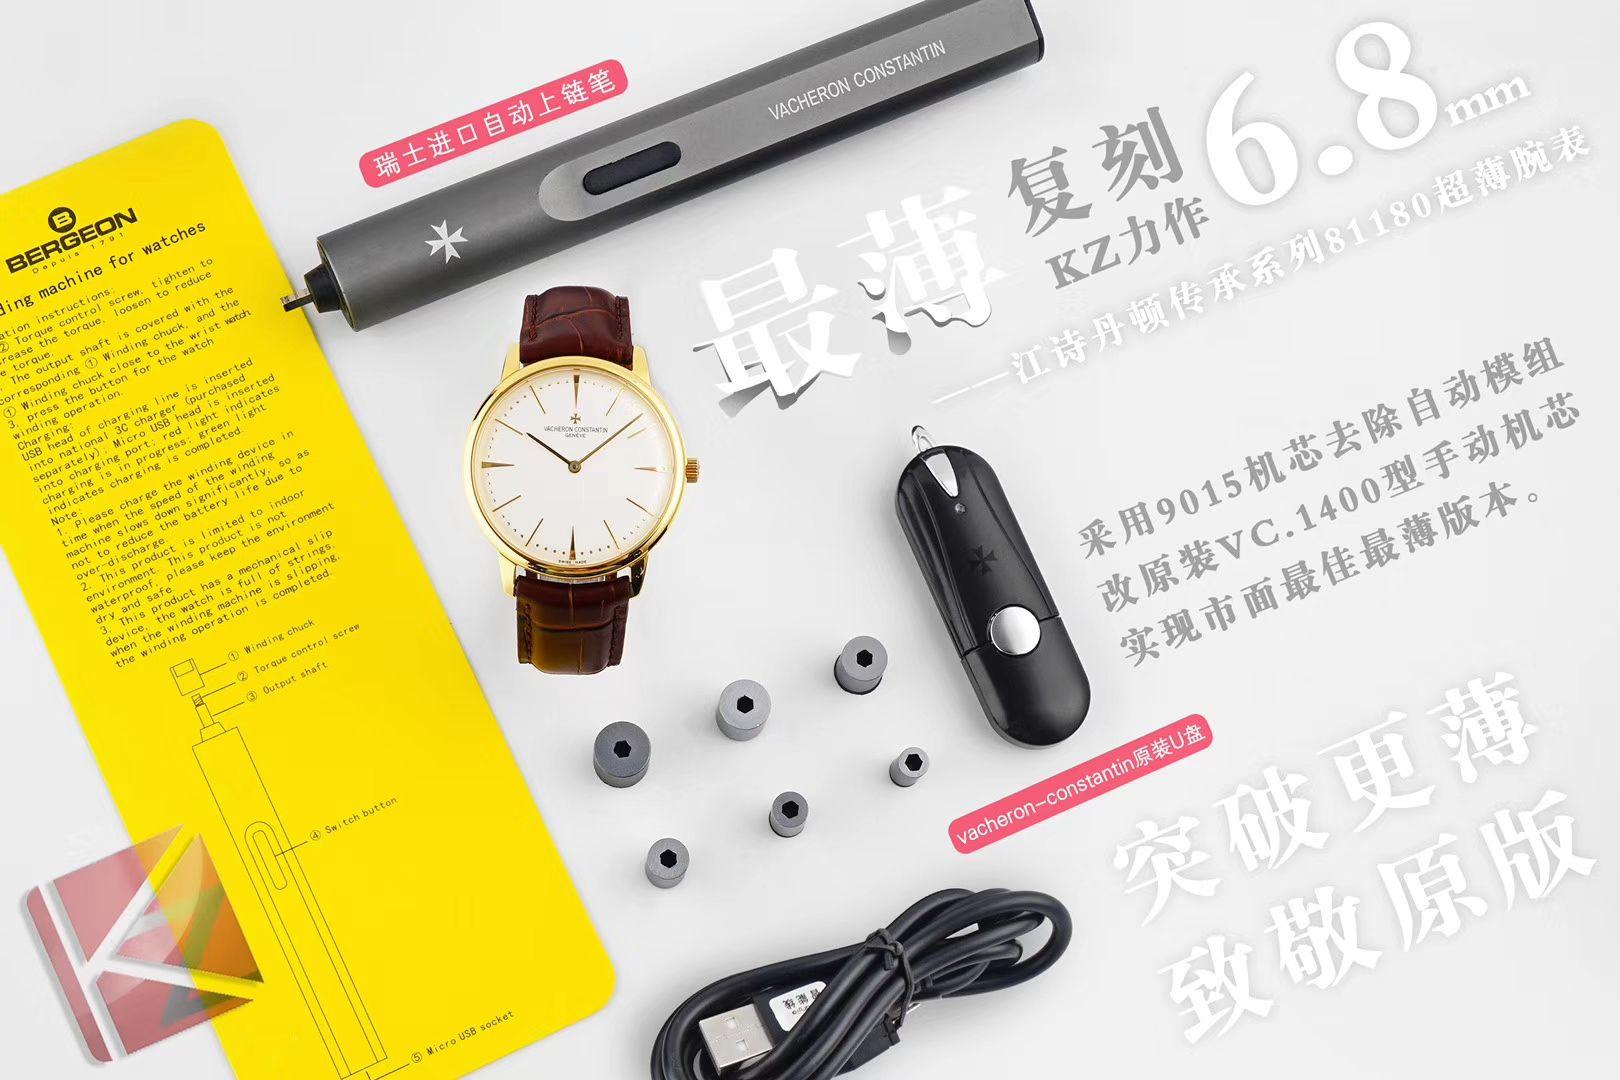 【KZ厂一比一超A高仿手表】江诗丹顿传承系列81180/000G-9117(白色),81180/000P-9539(深灰)腕表 / JS199